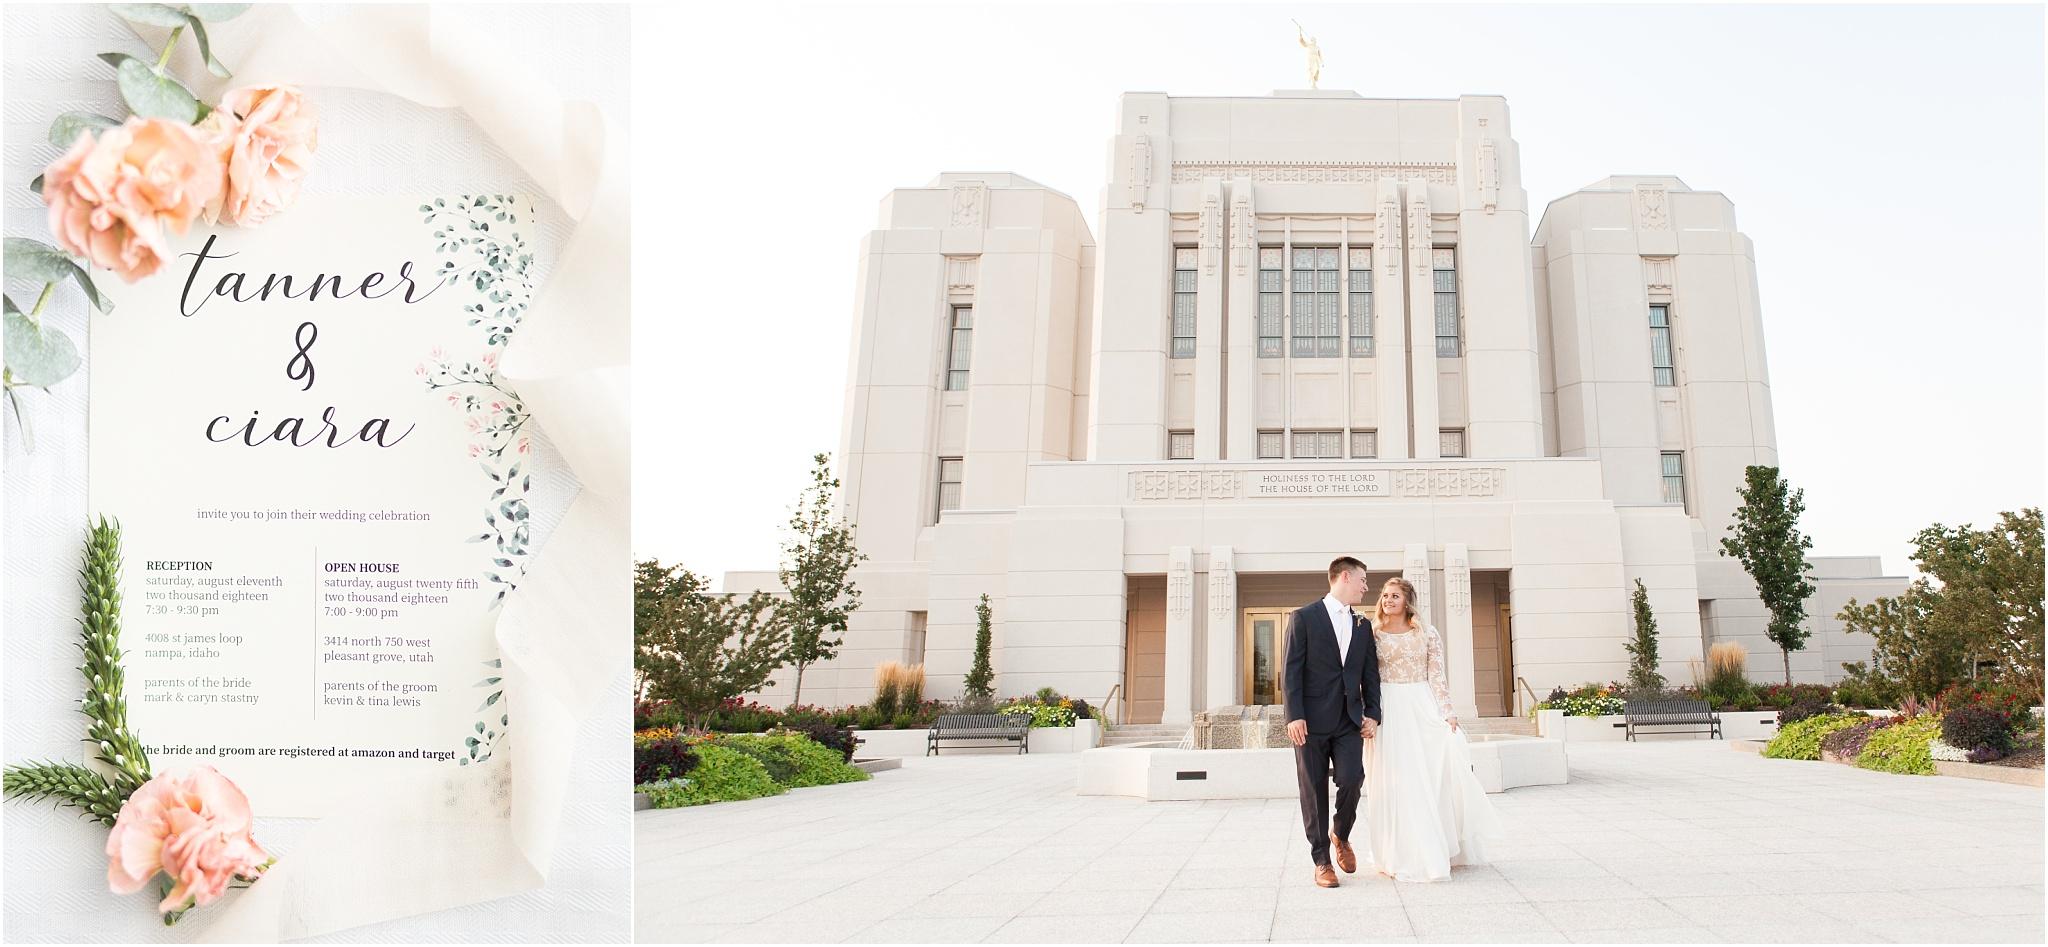 Wedding Photography_Meridian Idaho Temple_Boise Idaho_Nampa Idaho_Leah Southwick Photography_0010.jpg